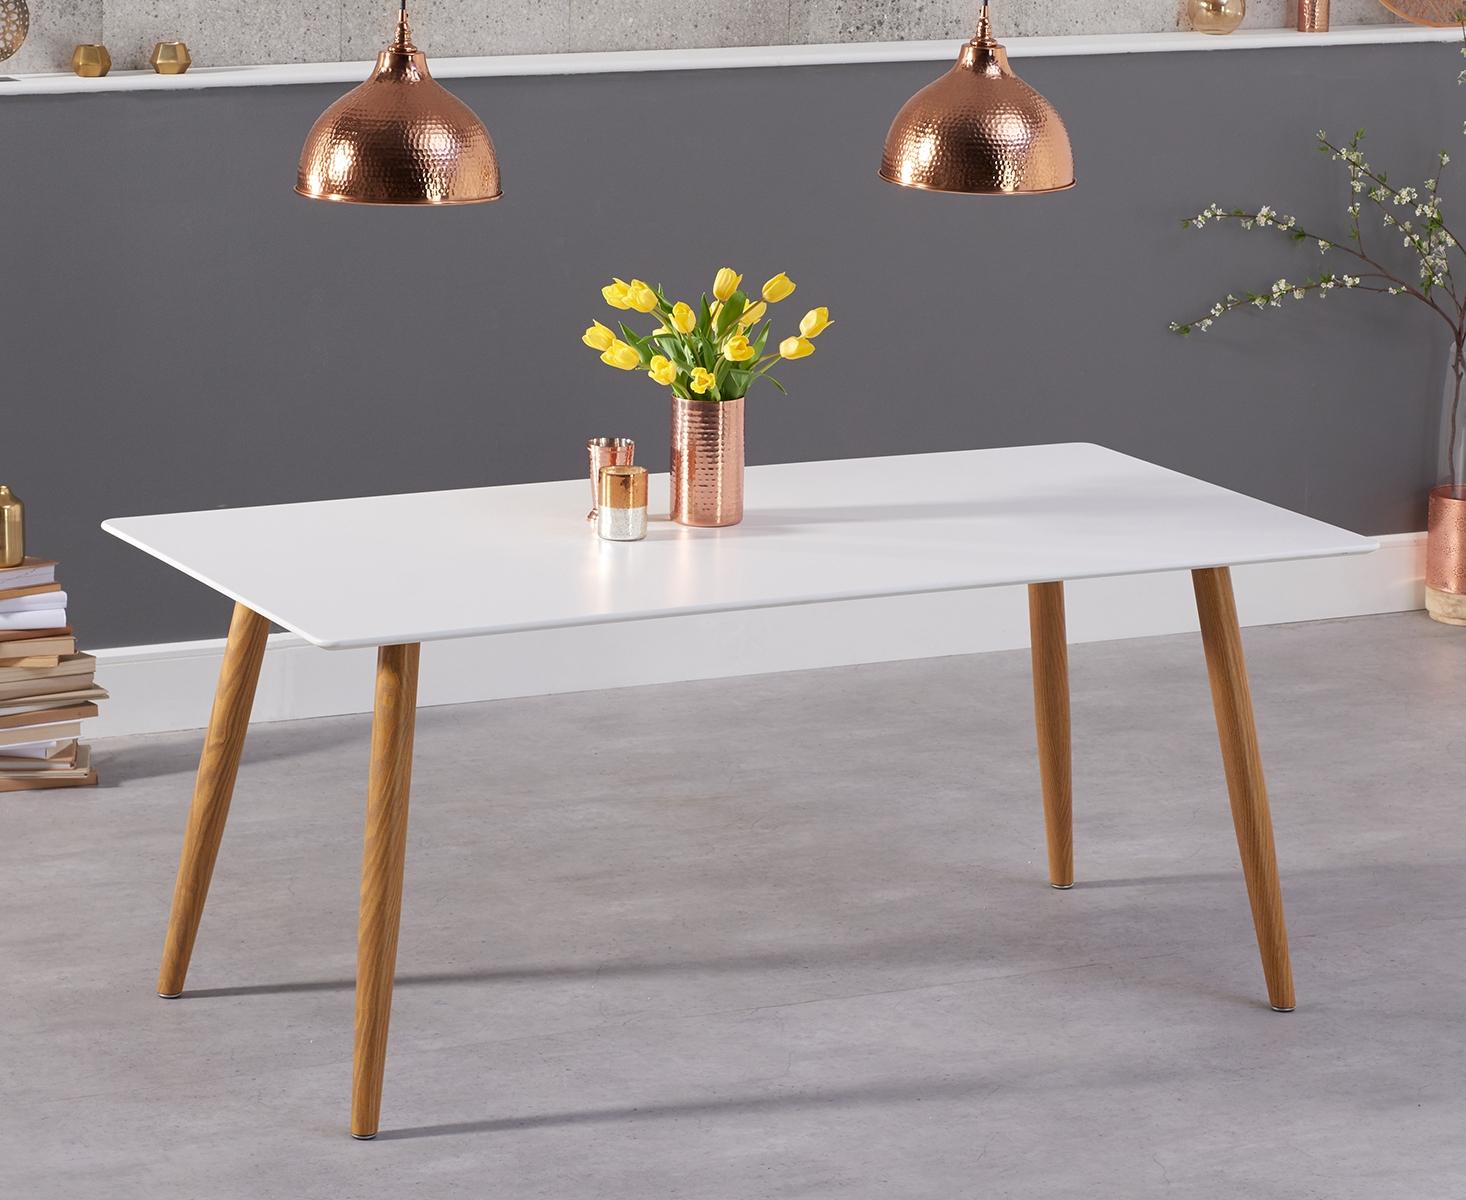 Maida Vale 180cm Matt White Dining Table